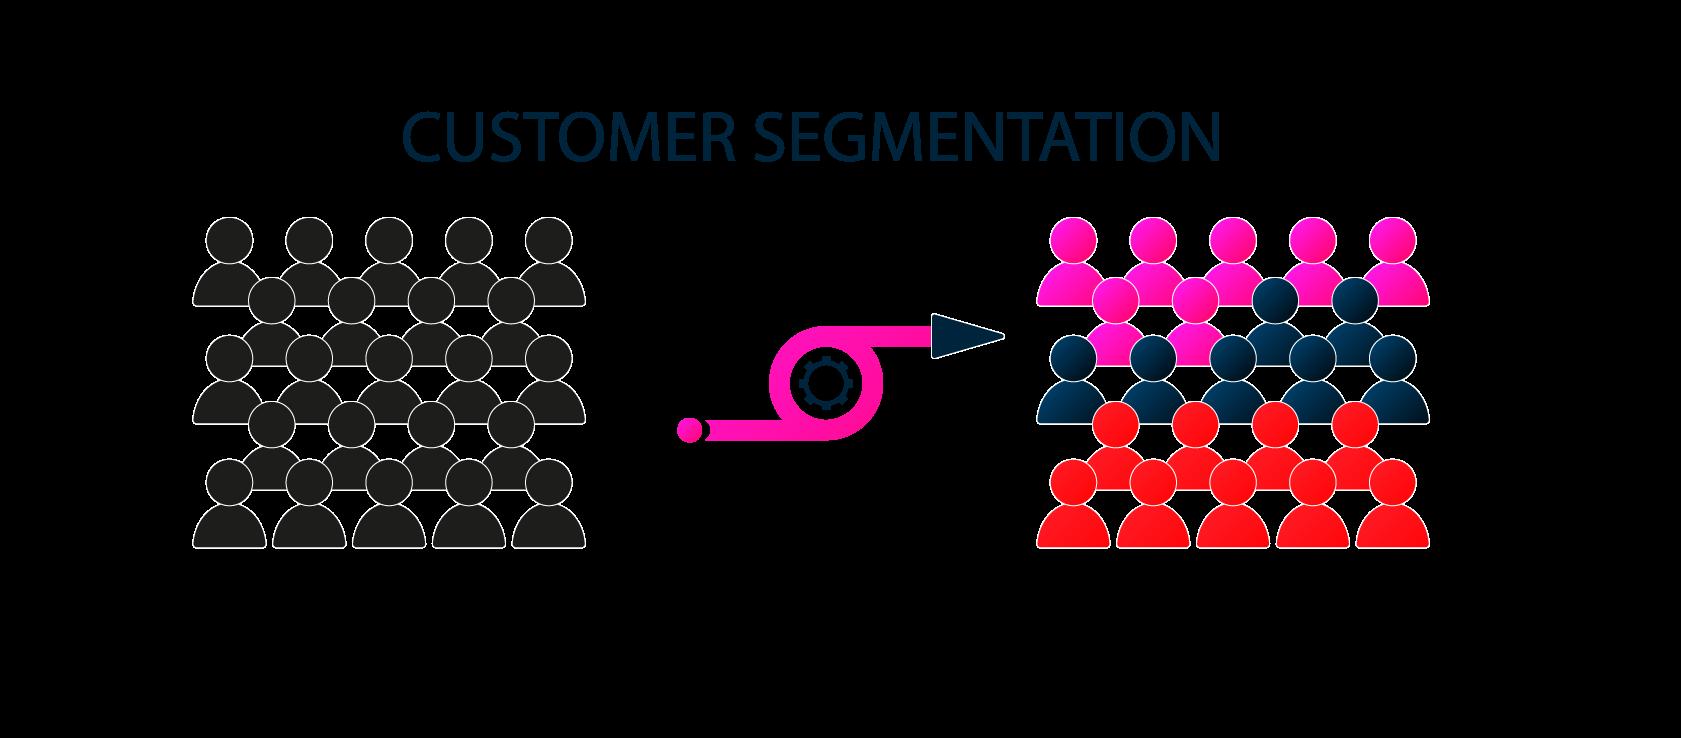 market segmentation in insurance